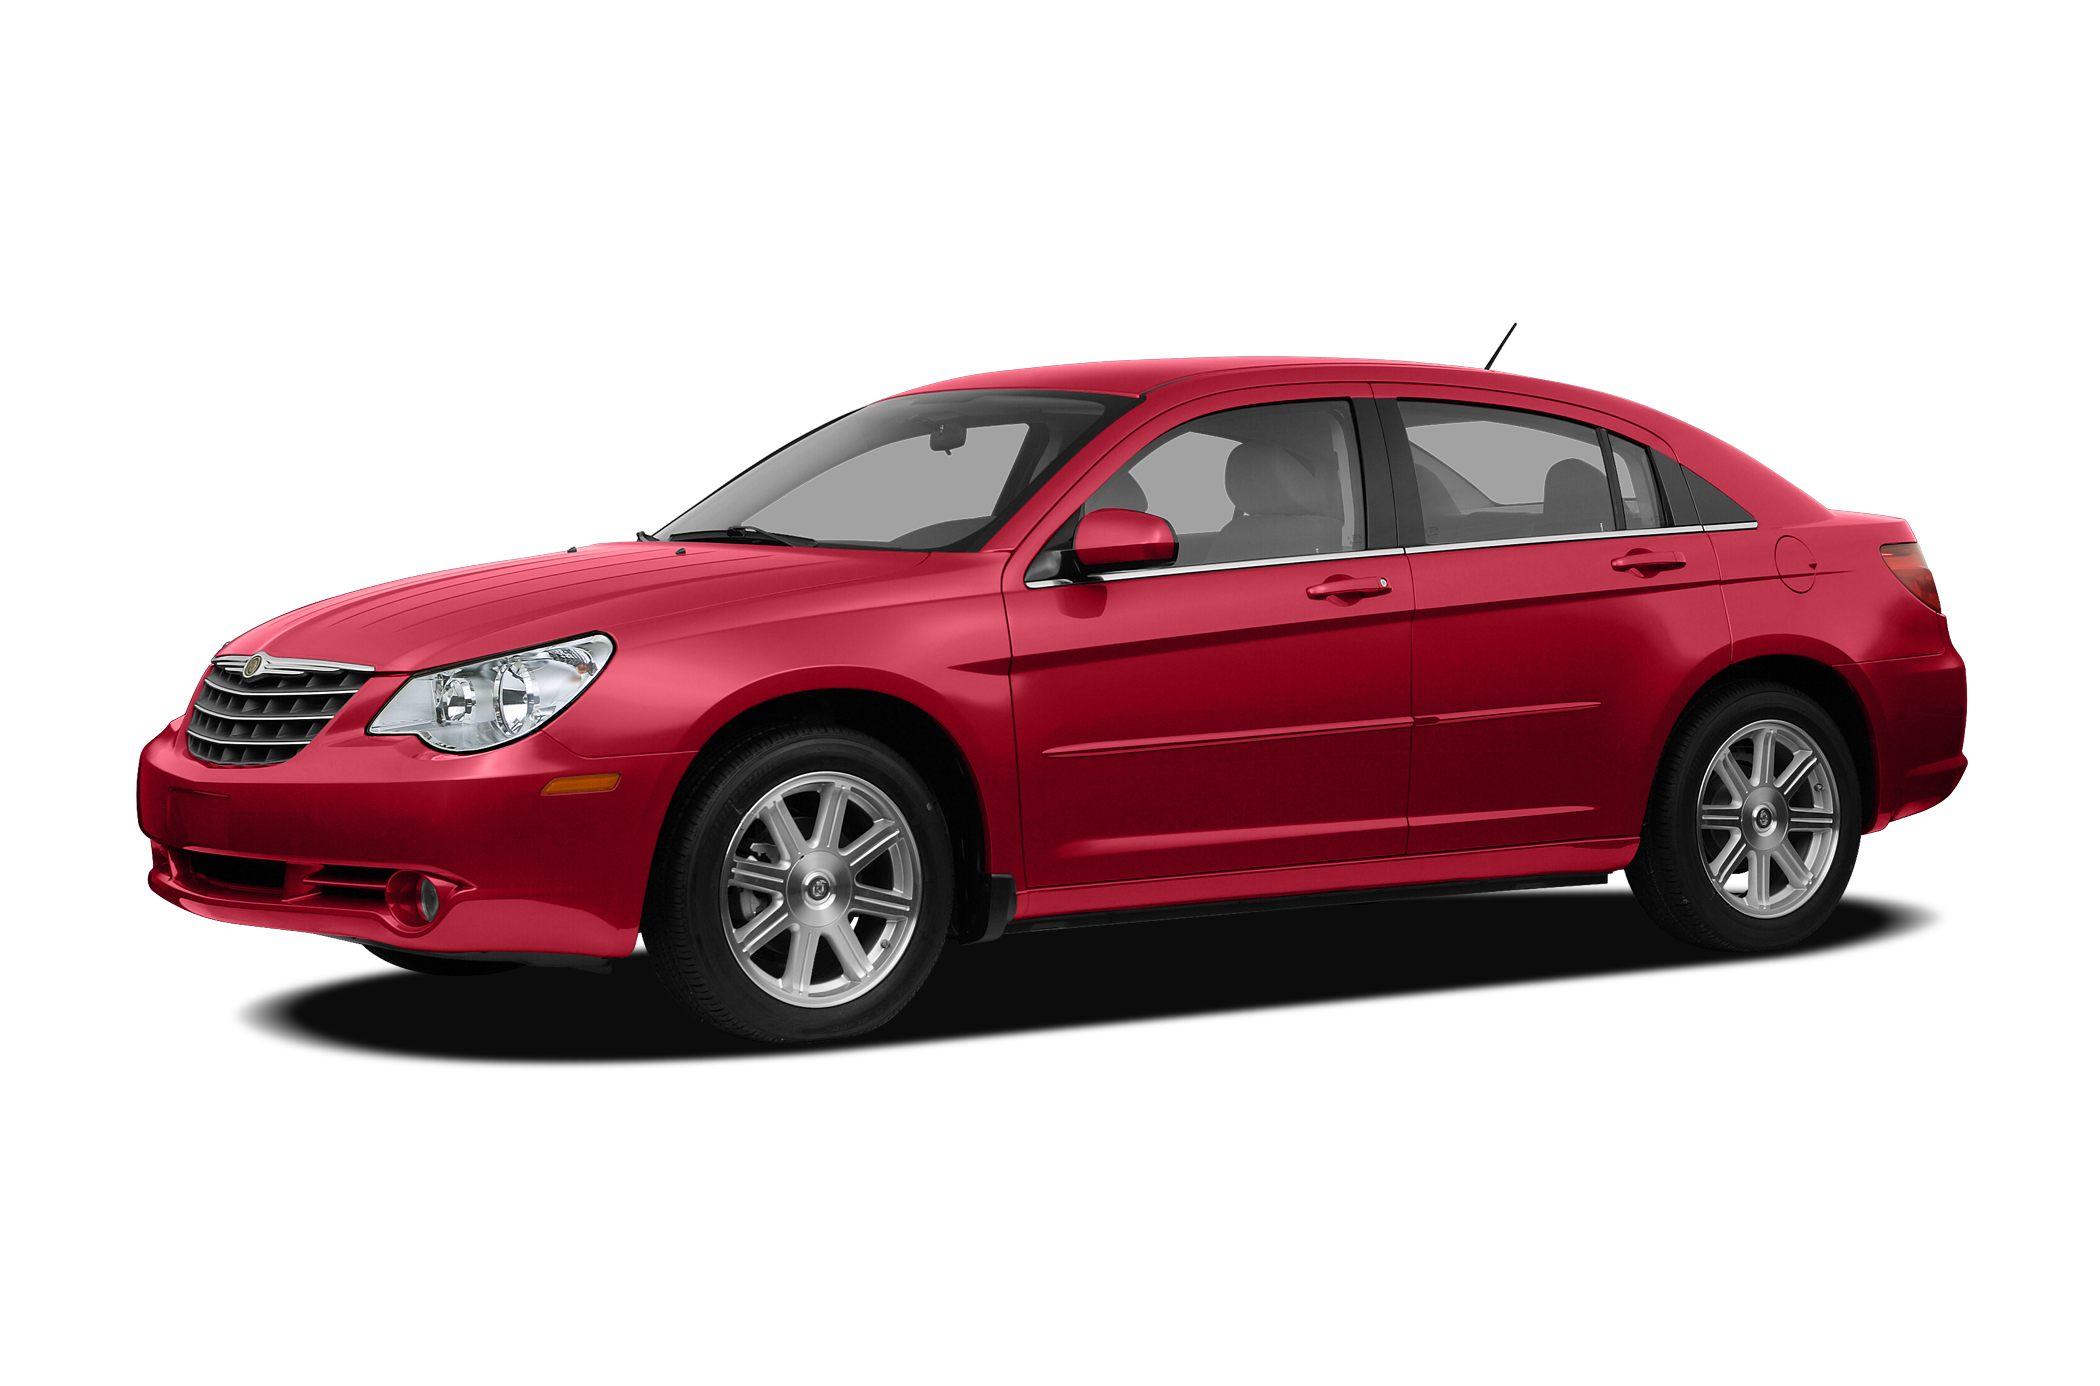 2007 Chrysler Sebring Limited Sedan for sale in Nashville for $9,979 with 87,015 miles.